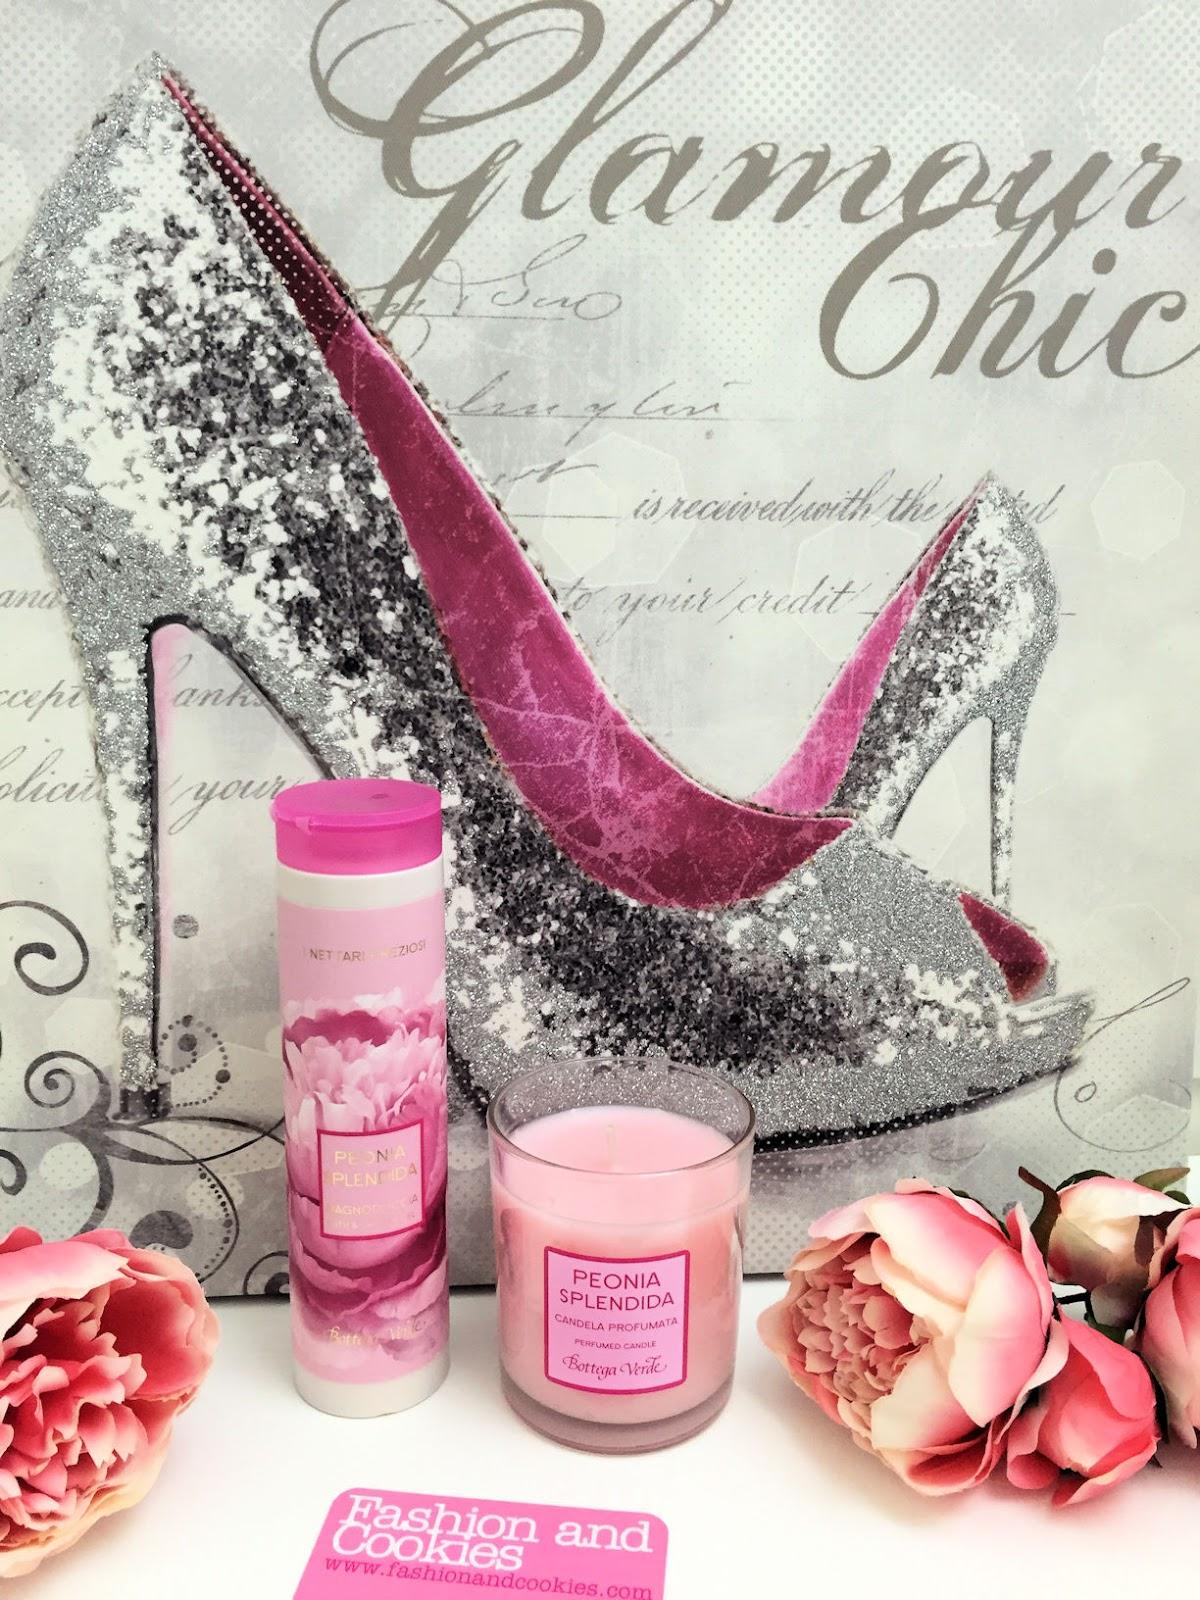 Nettari Preziosi Bottega Verde: Peonia Splendida su Fashion and Cookies fashion and beauty blog, beauty blogger